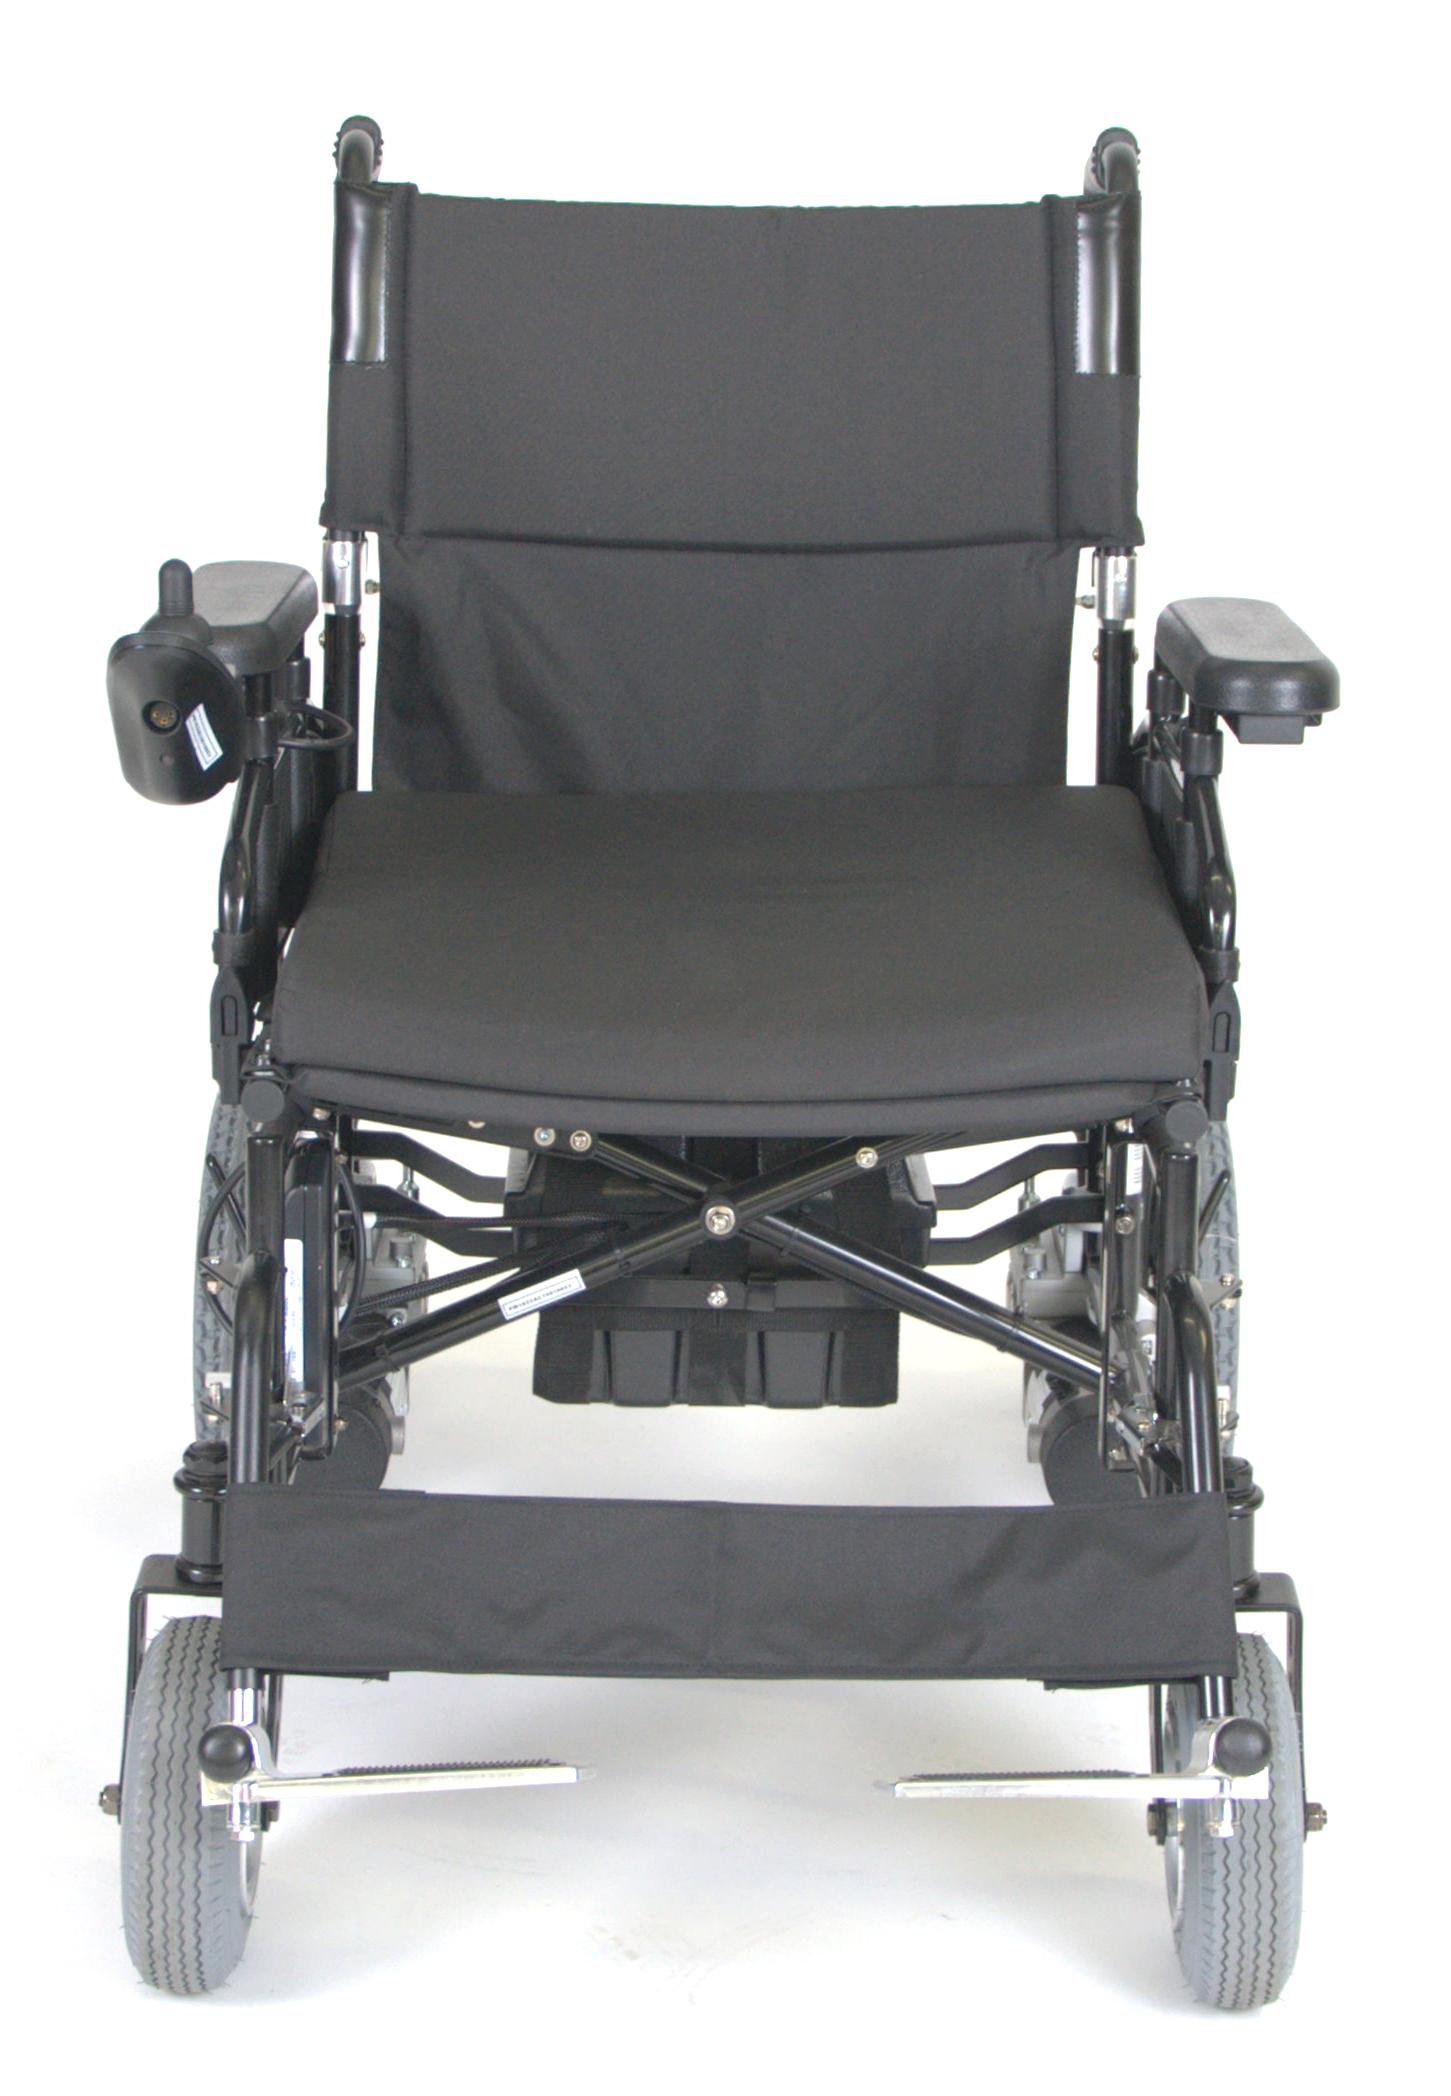 wildcat-450-heavy-duty-folding-power-wheelchair-wildcat450-22-drive-medical-2.jpg